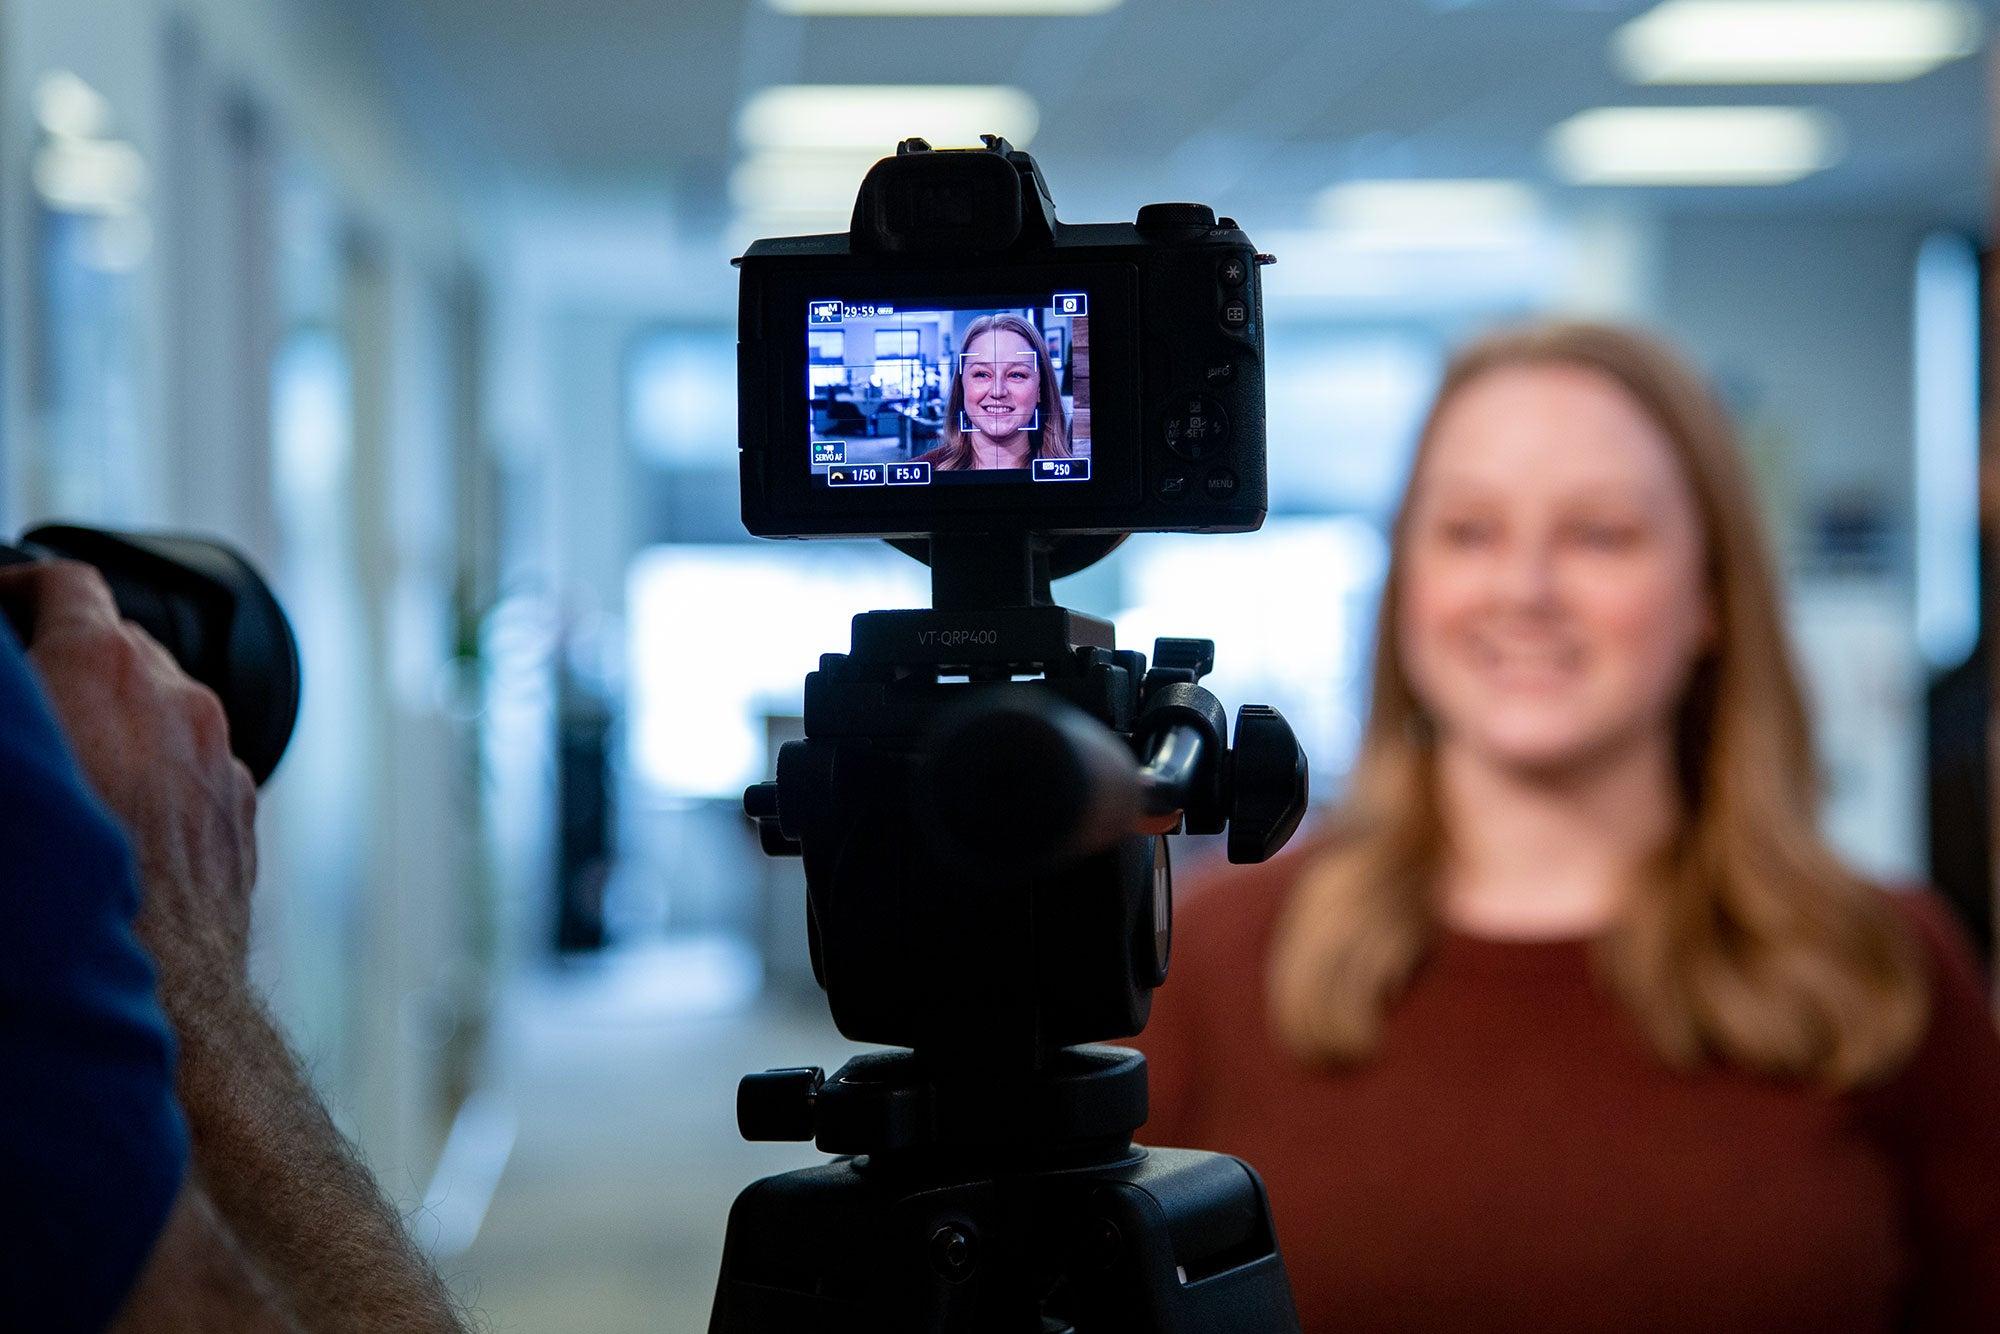 PR professional Julie Chigbrow, on camera.